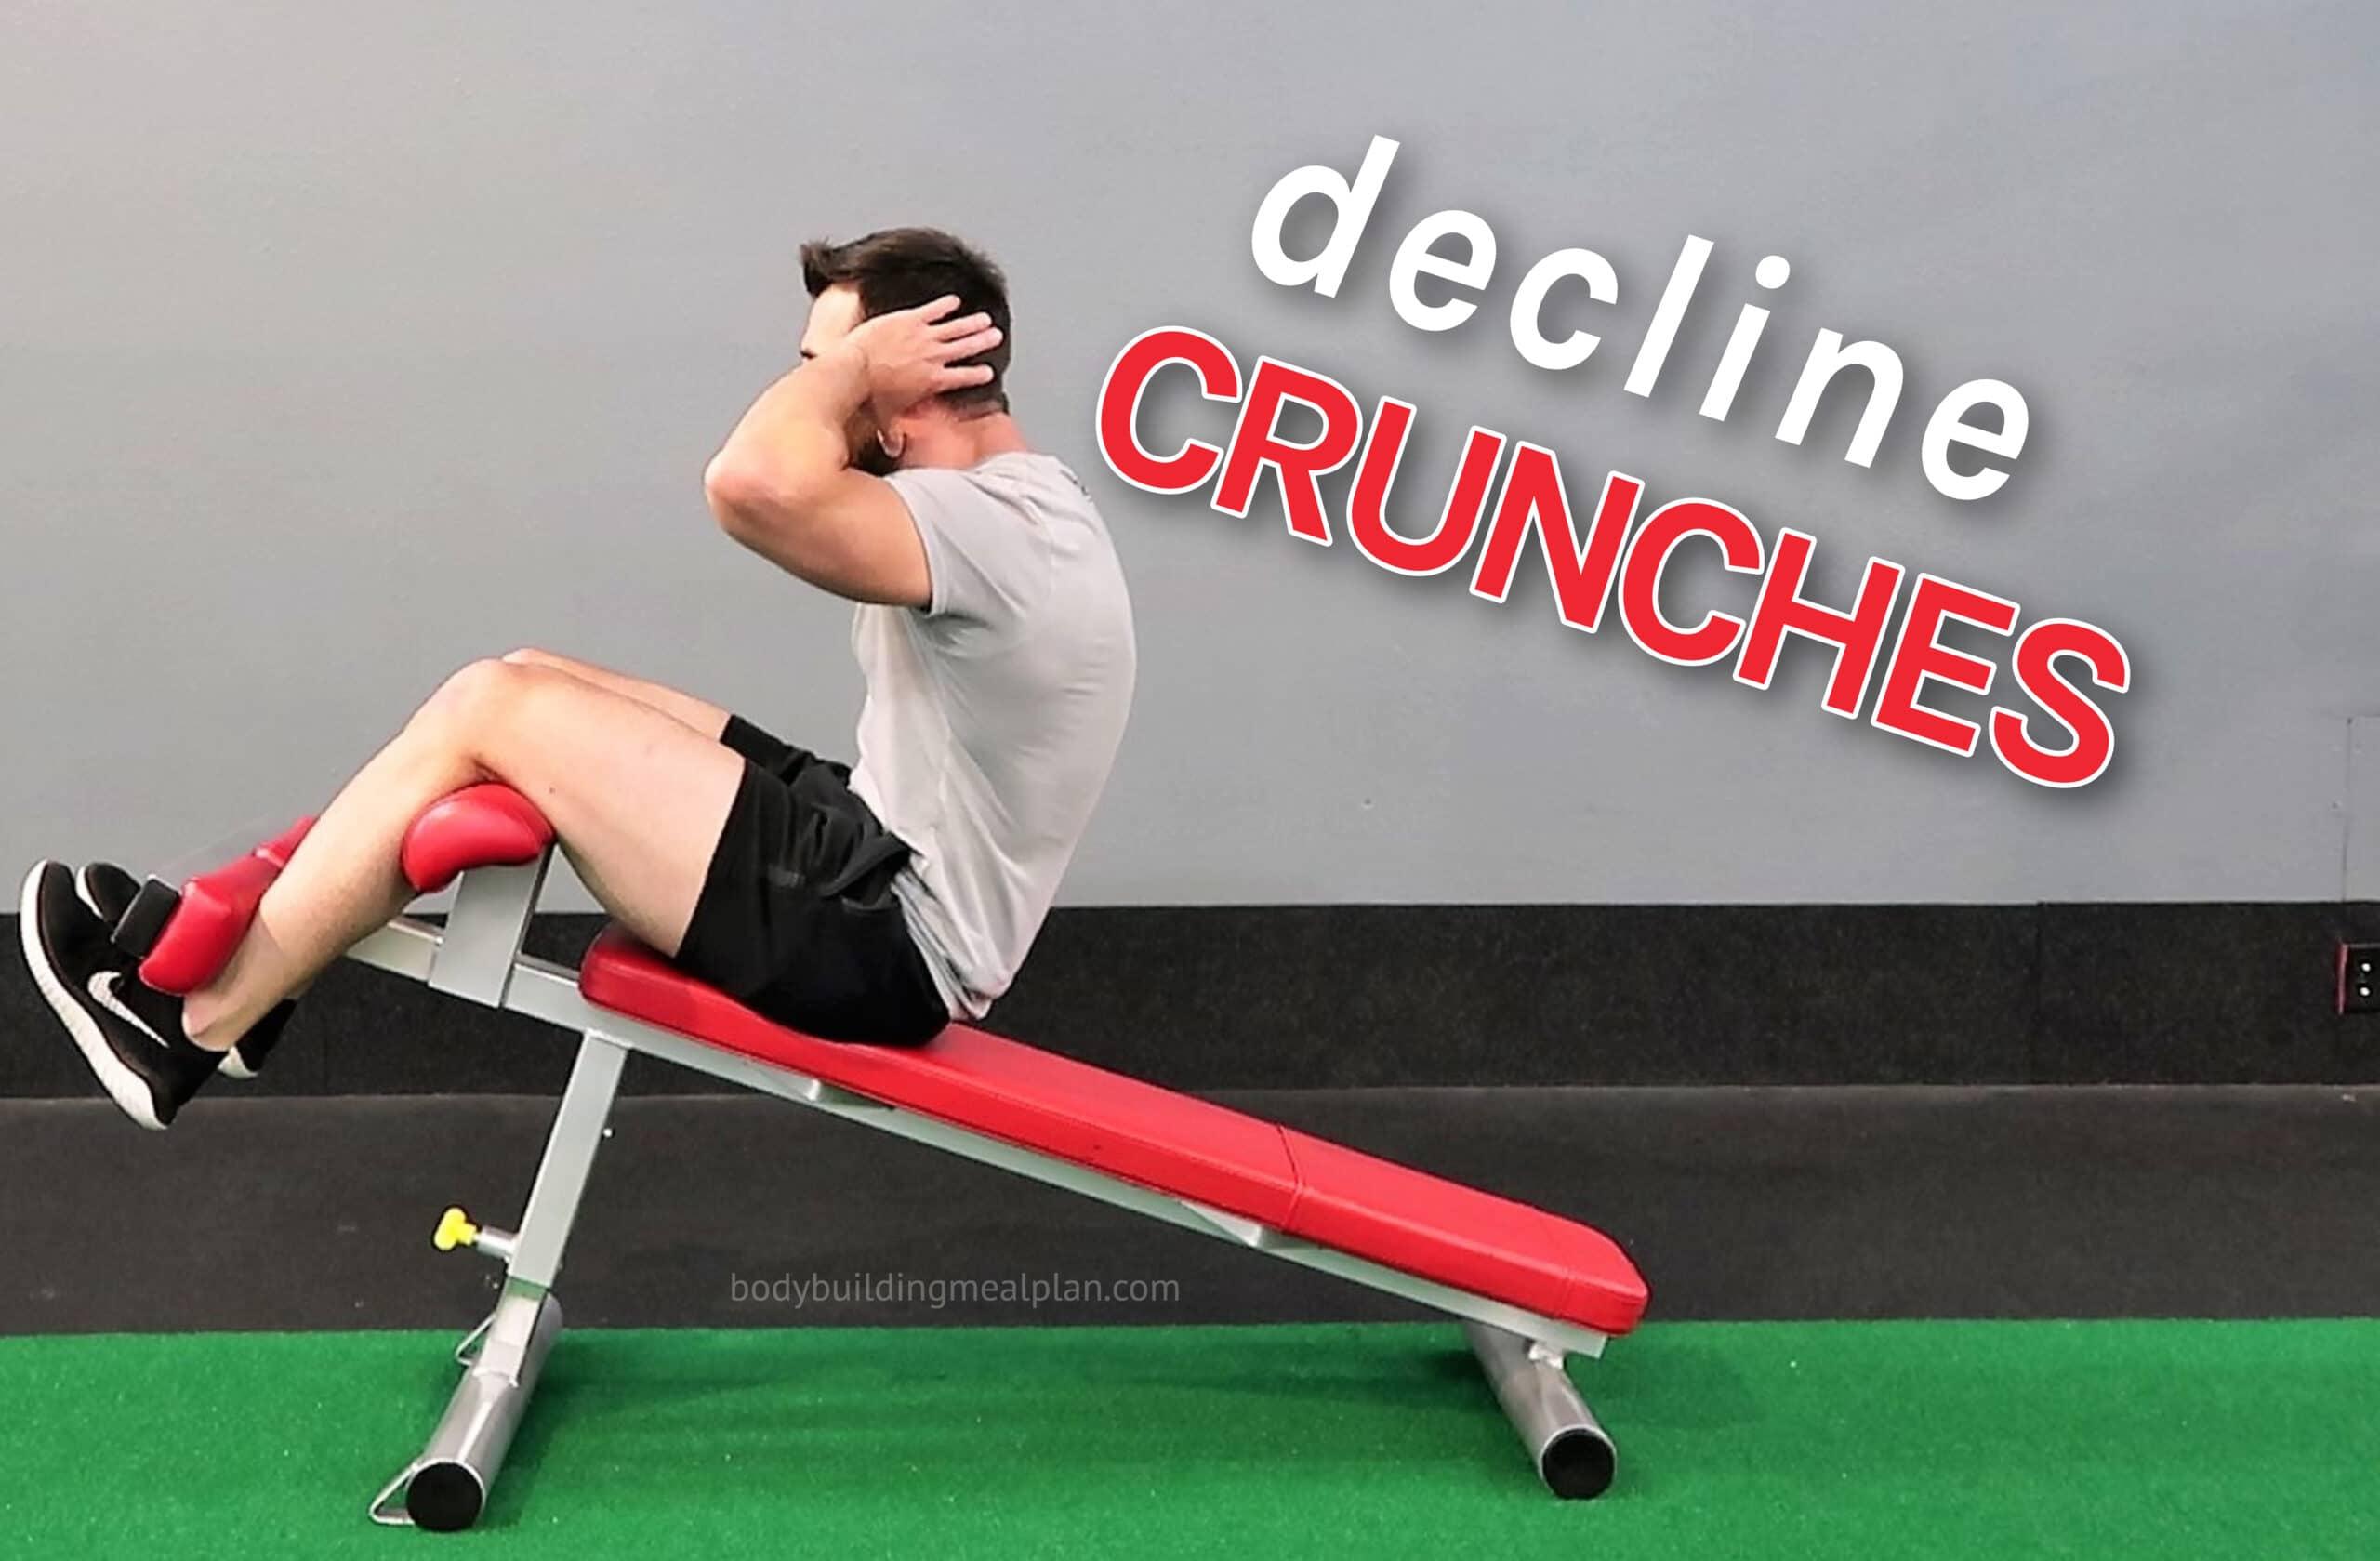 Decline Crunches